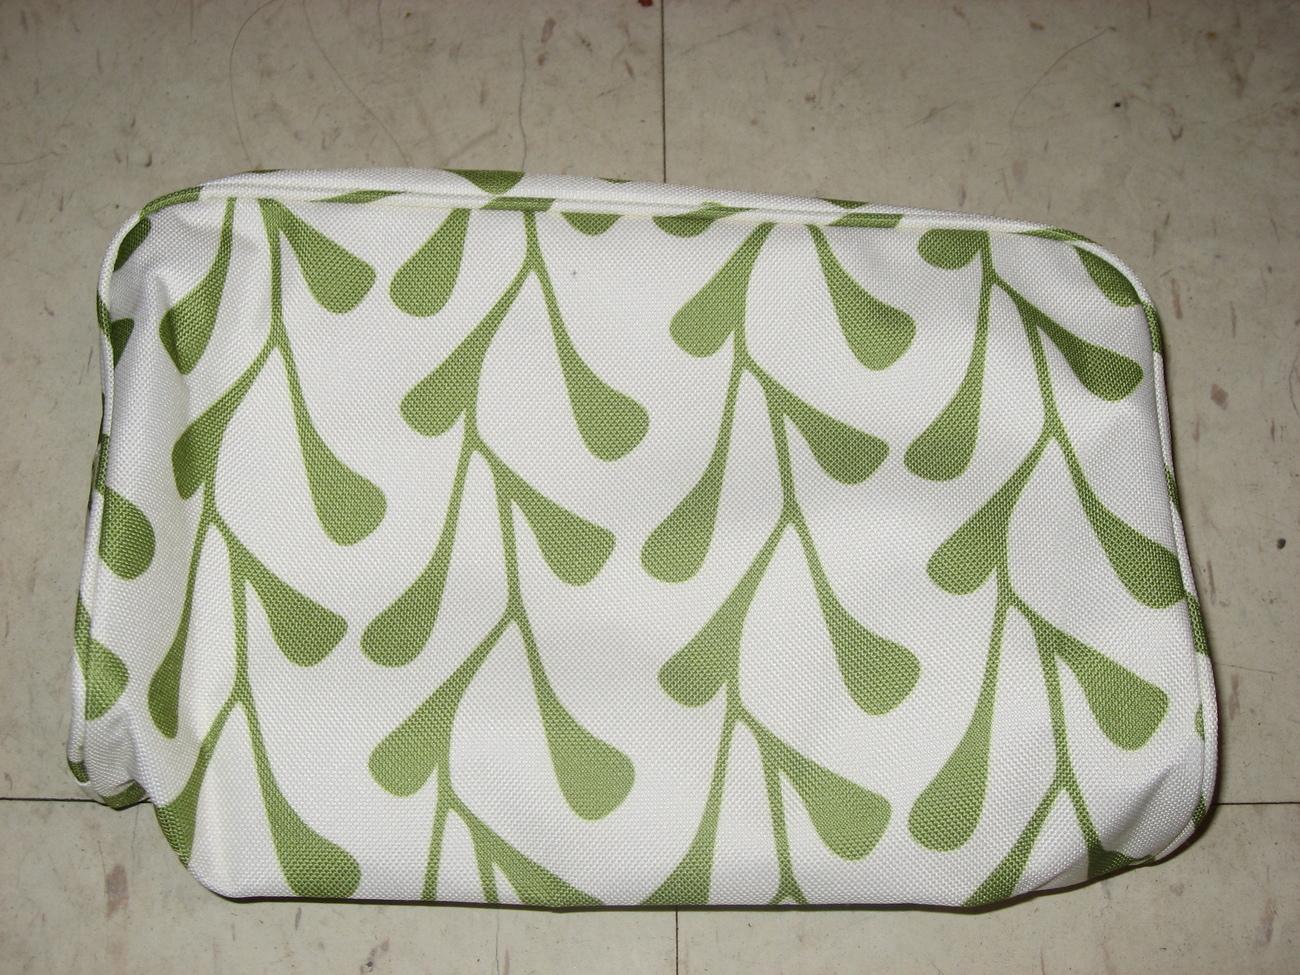 Clinique white green floral travel bag